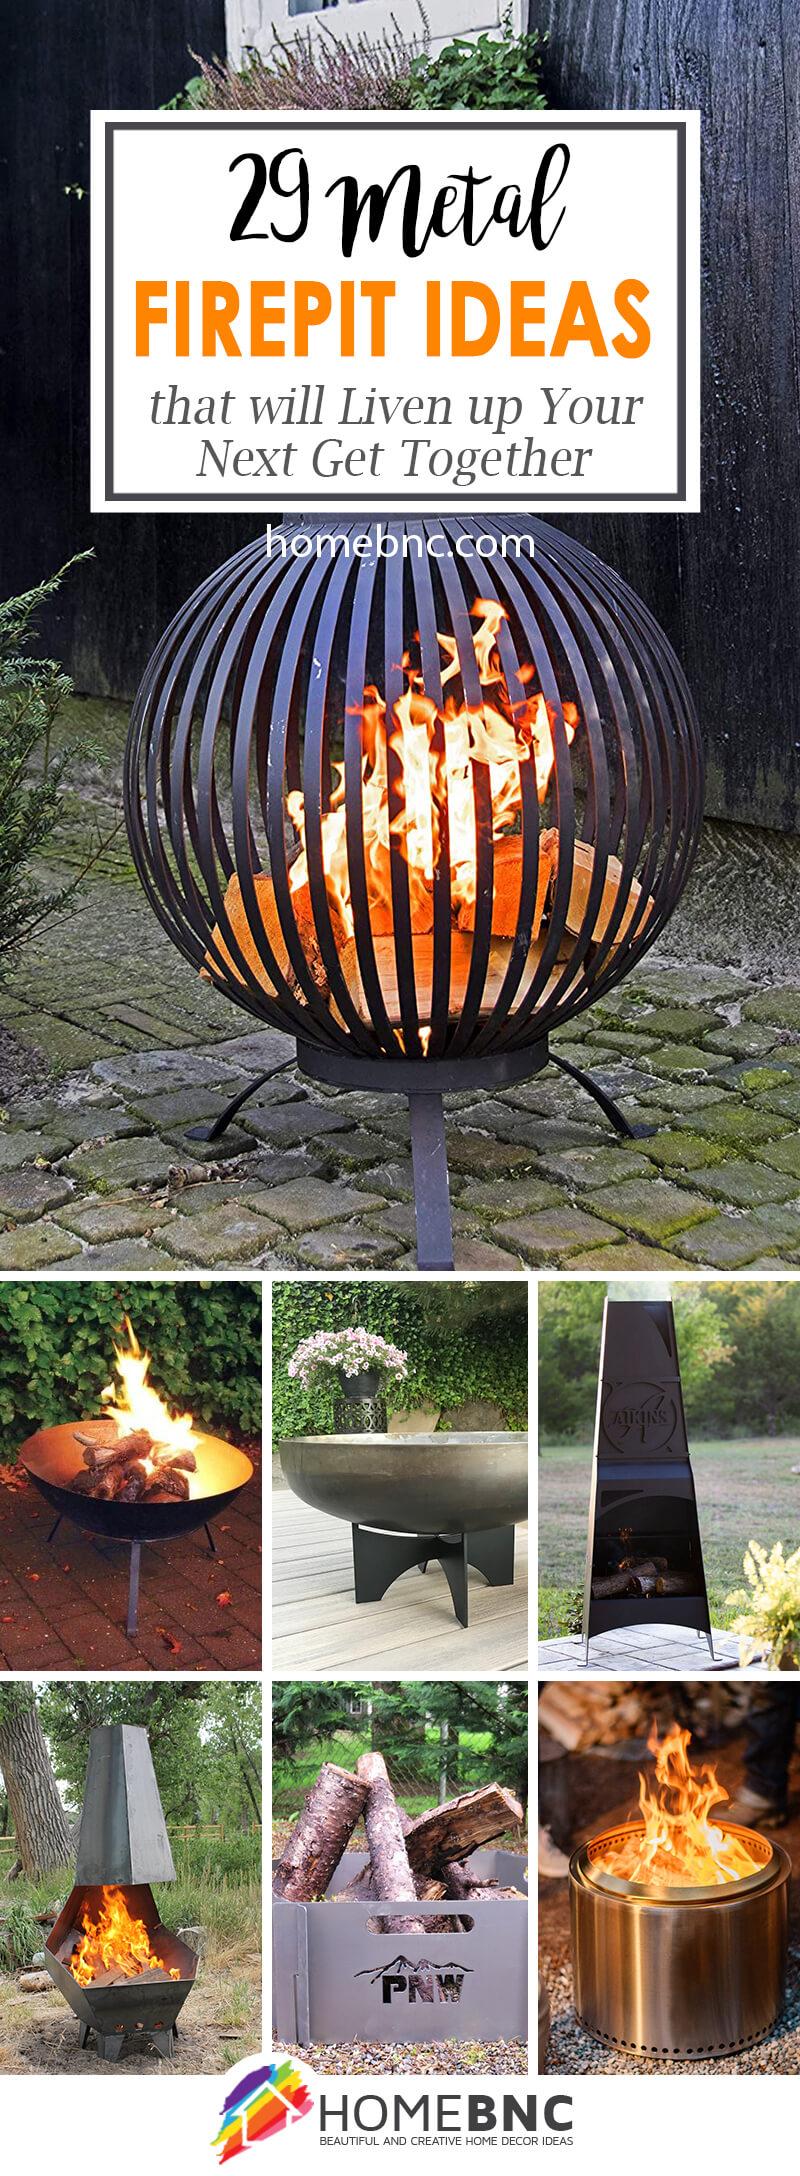 29 Best Metal Fire Pit Ideas to Modernize your Backyard in ... on Best Fire Pit Design id=77517